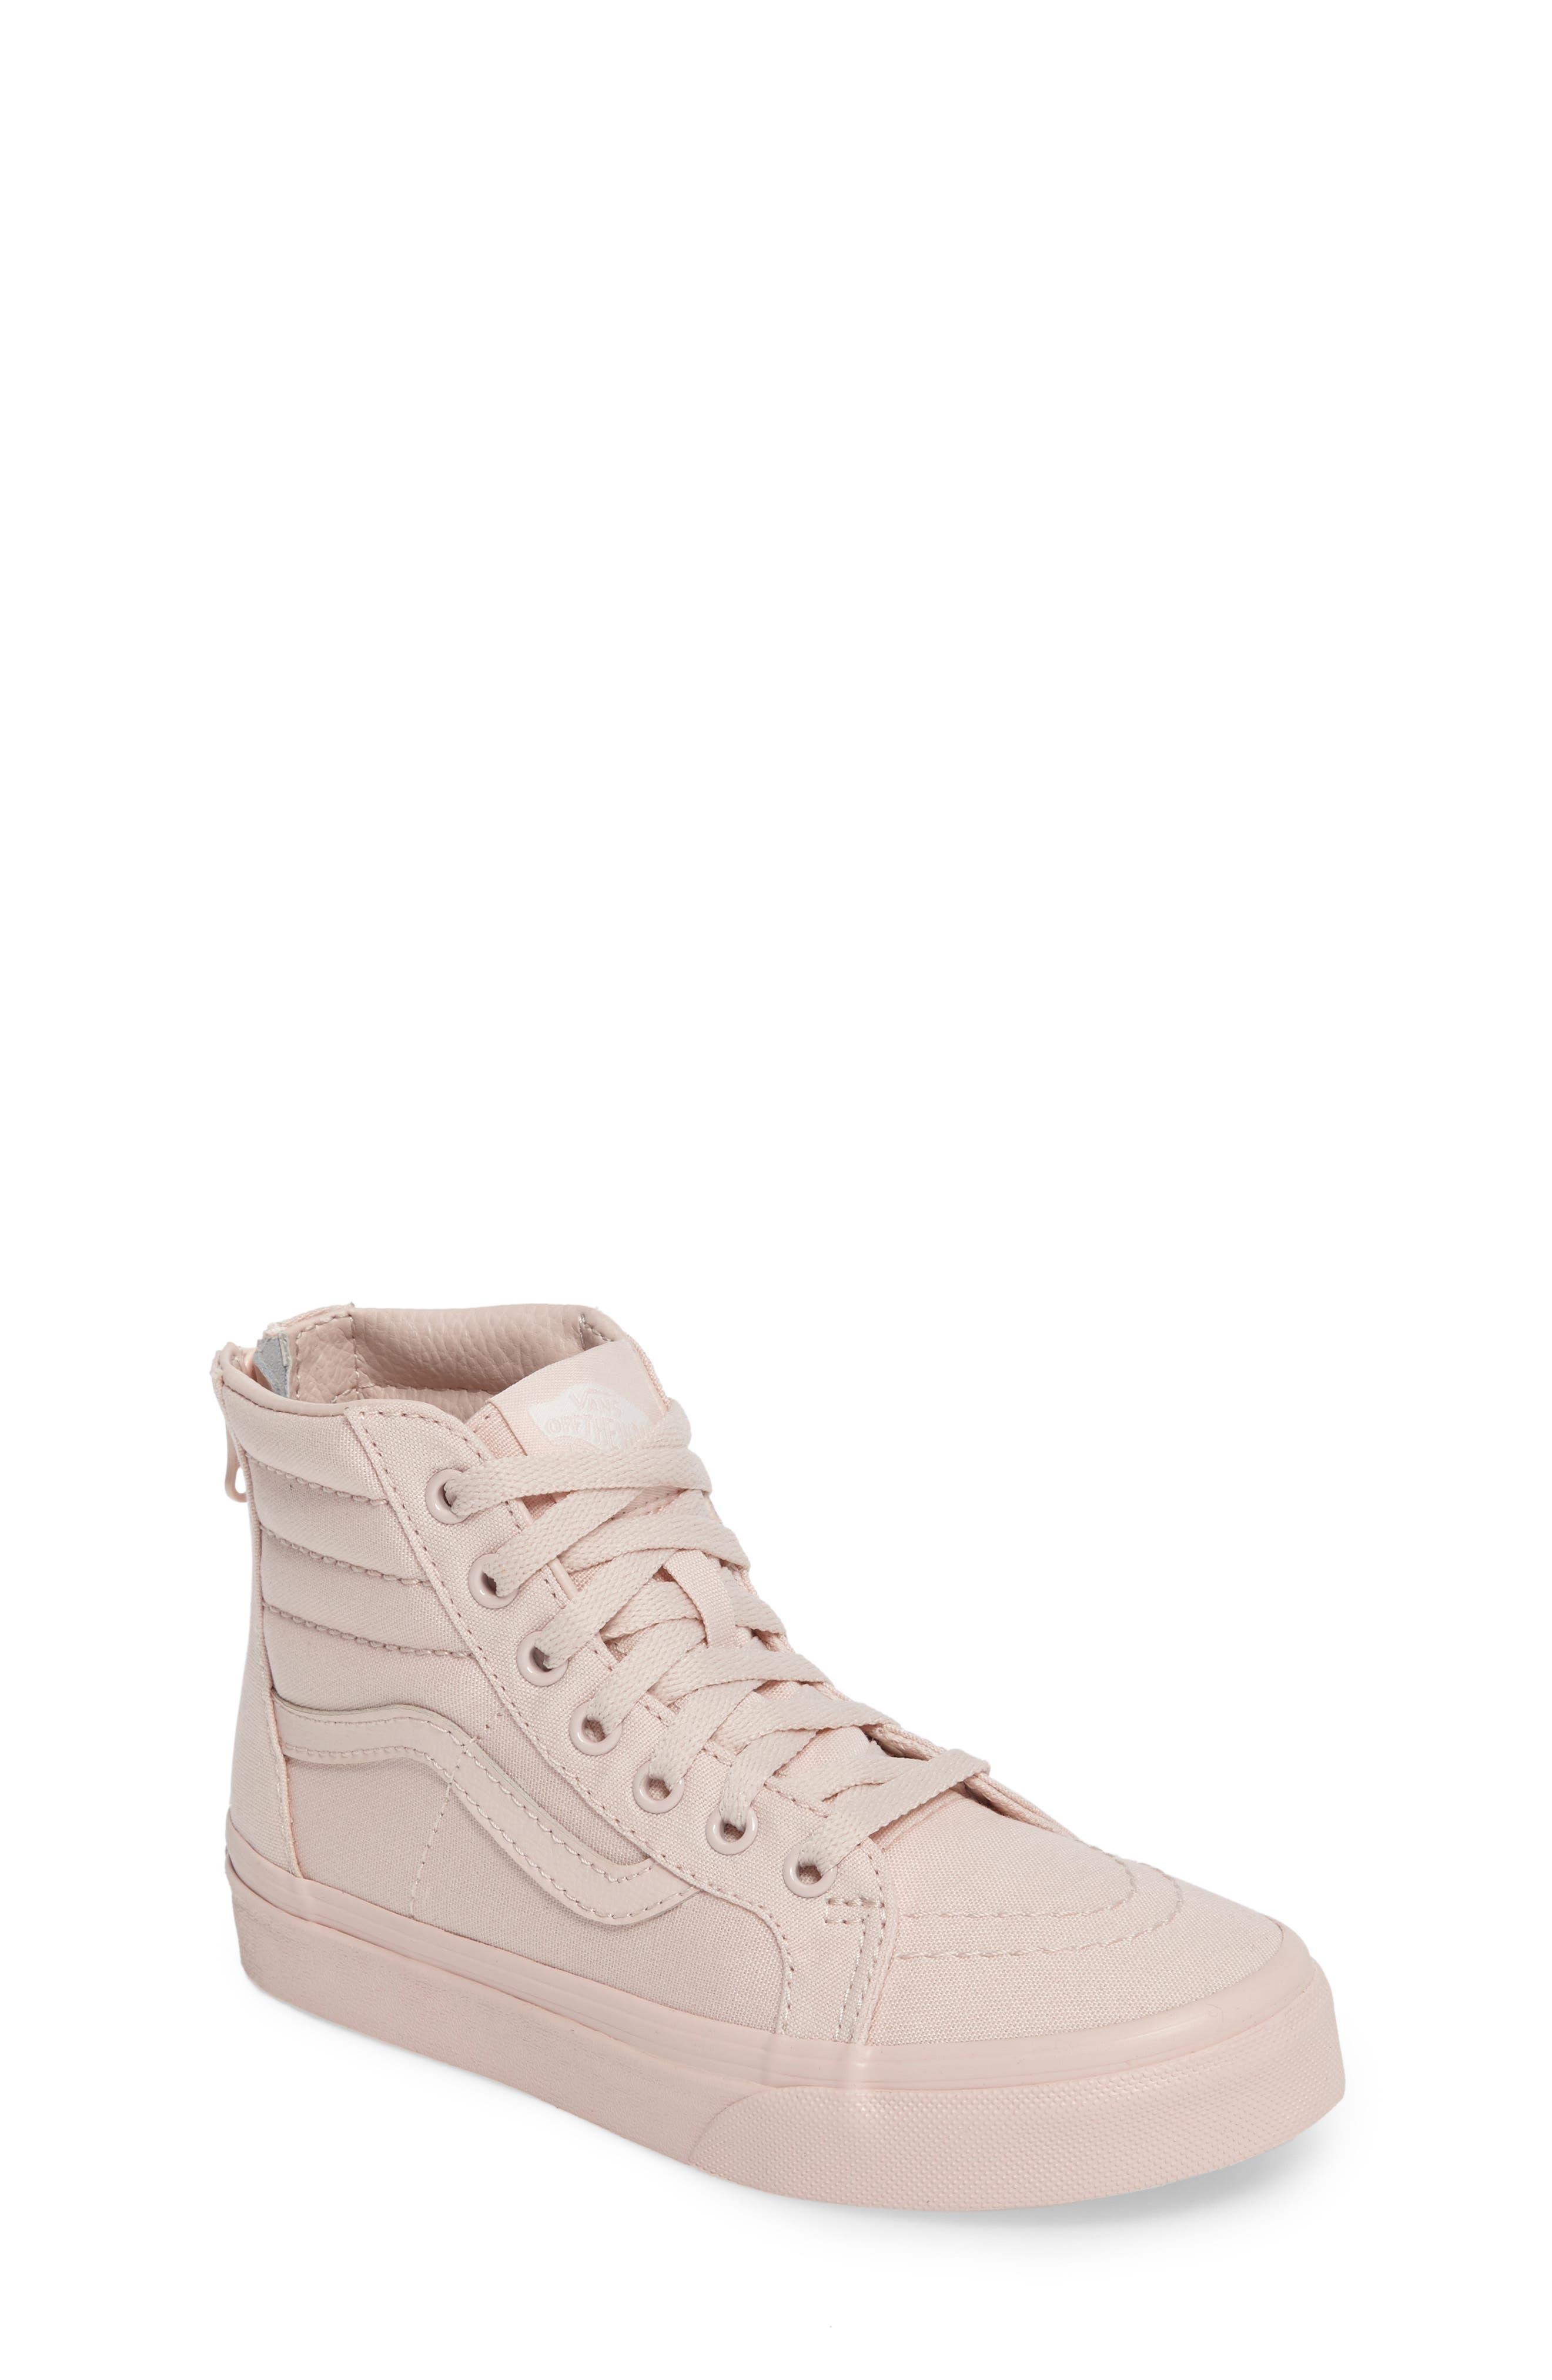 SK8-Hi Zip Sneaker,                             Main thumbnail 1, color,                             Peach Blush Canvas